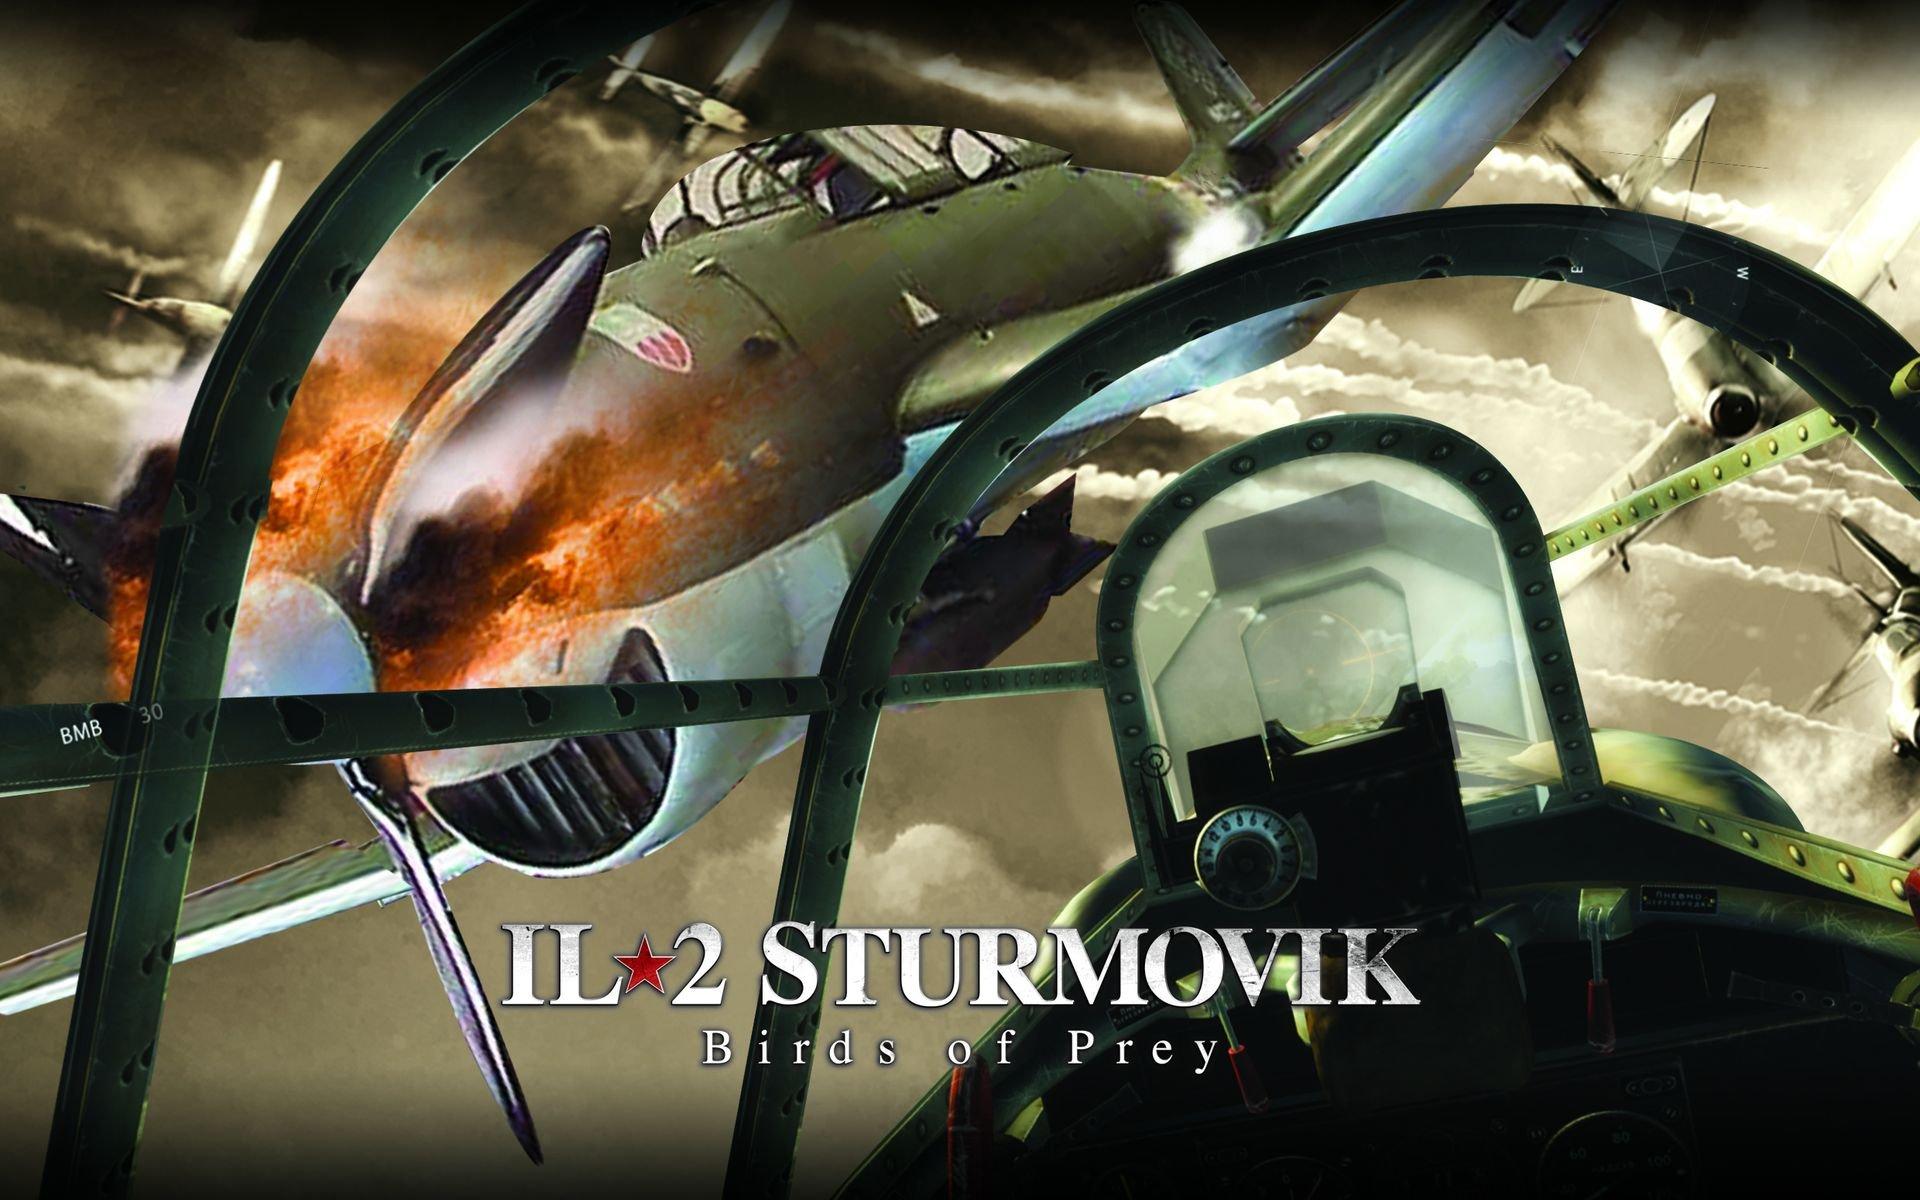 IL-2 Sturmovik: Birds Of Prey HD wallpapers, Desktop wallpaper - most viewed